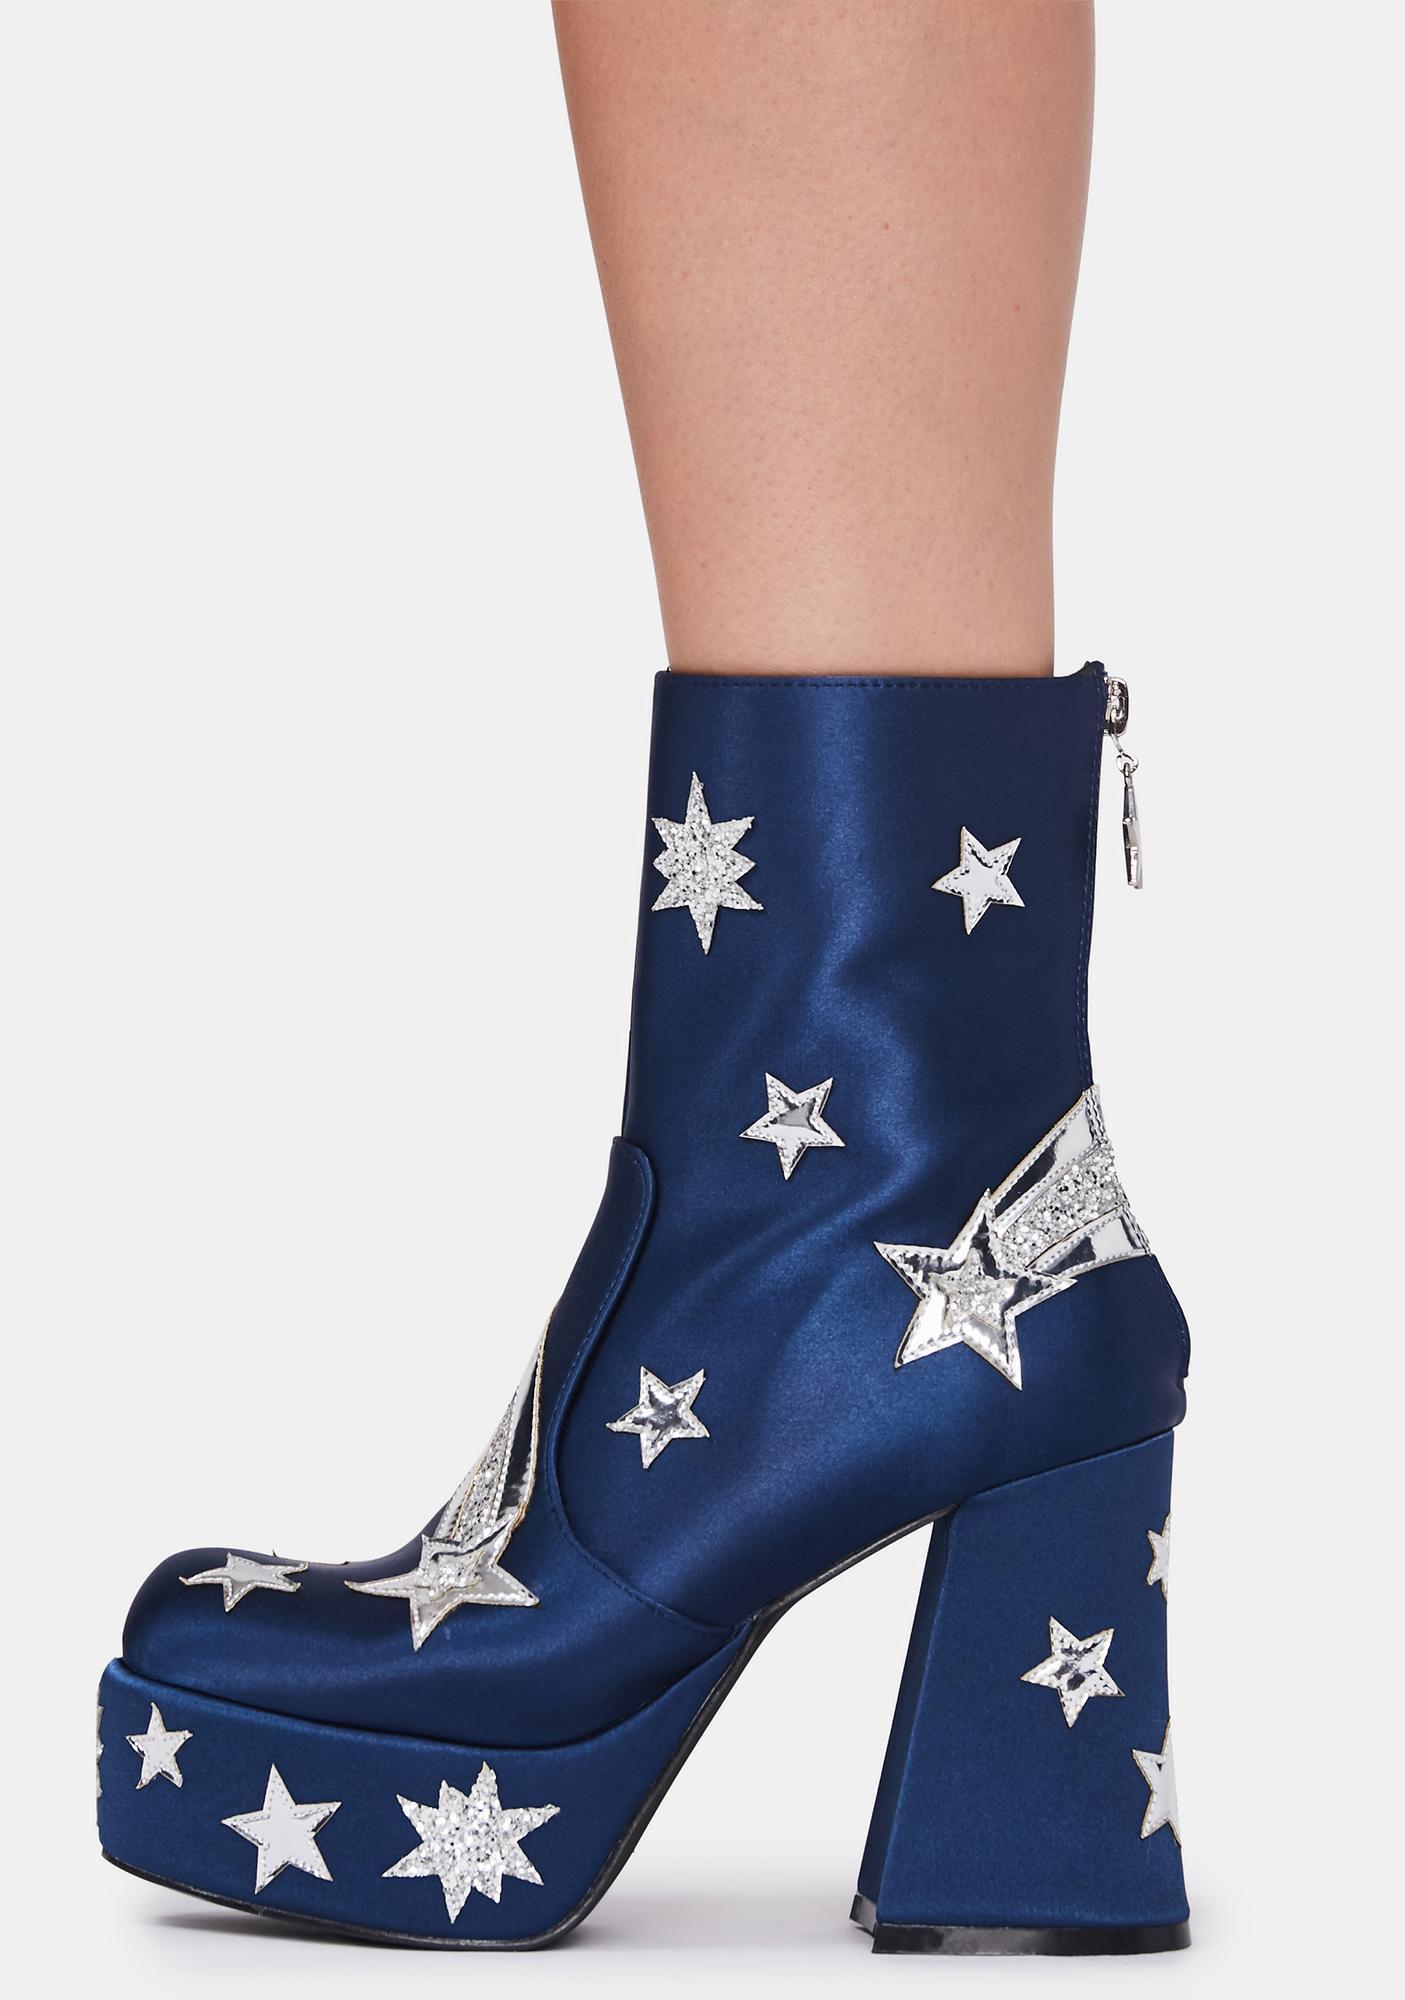 HOROSCOPEZ Made From Stardust Platform Boots